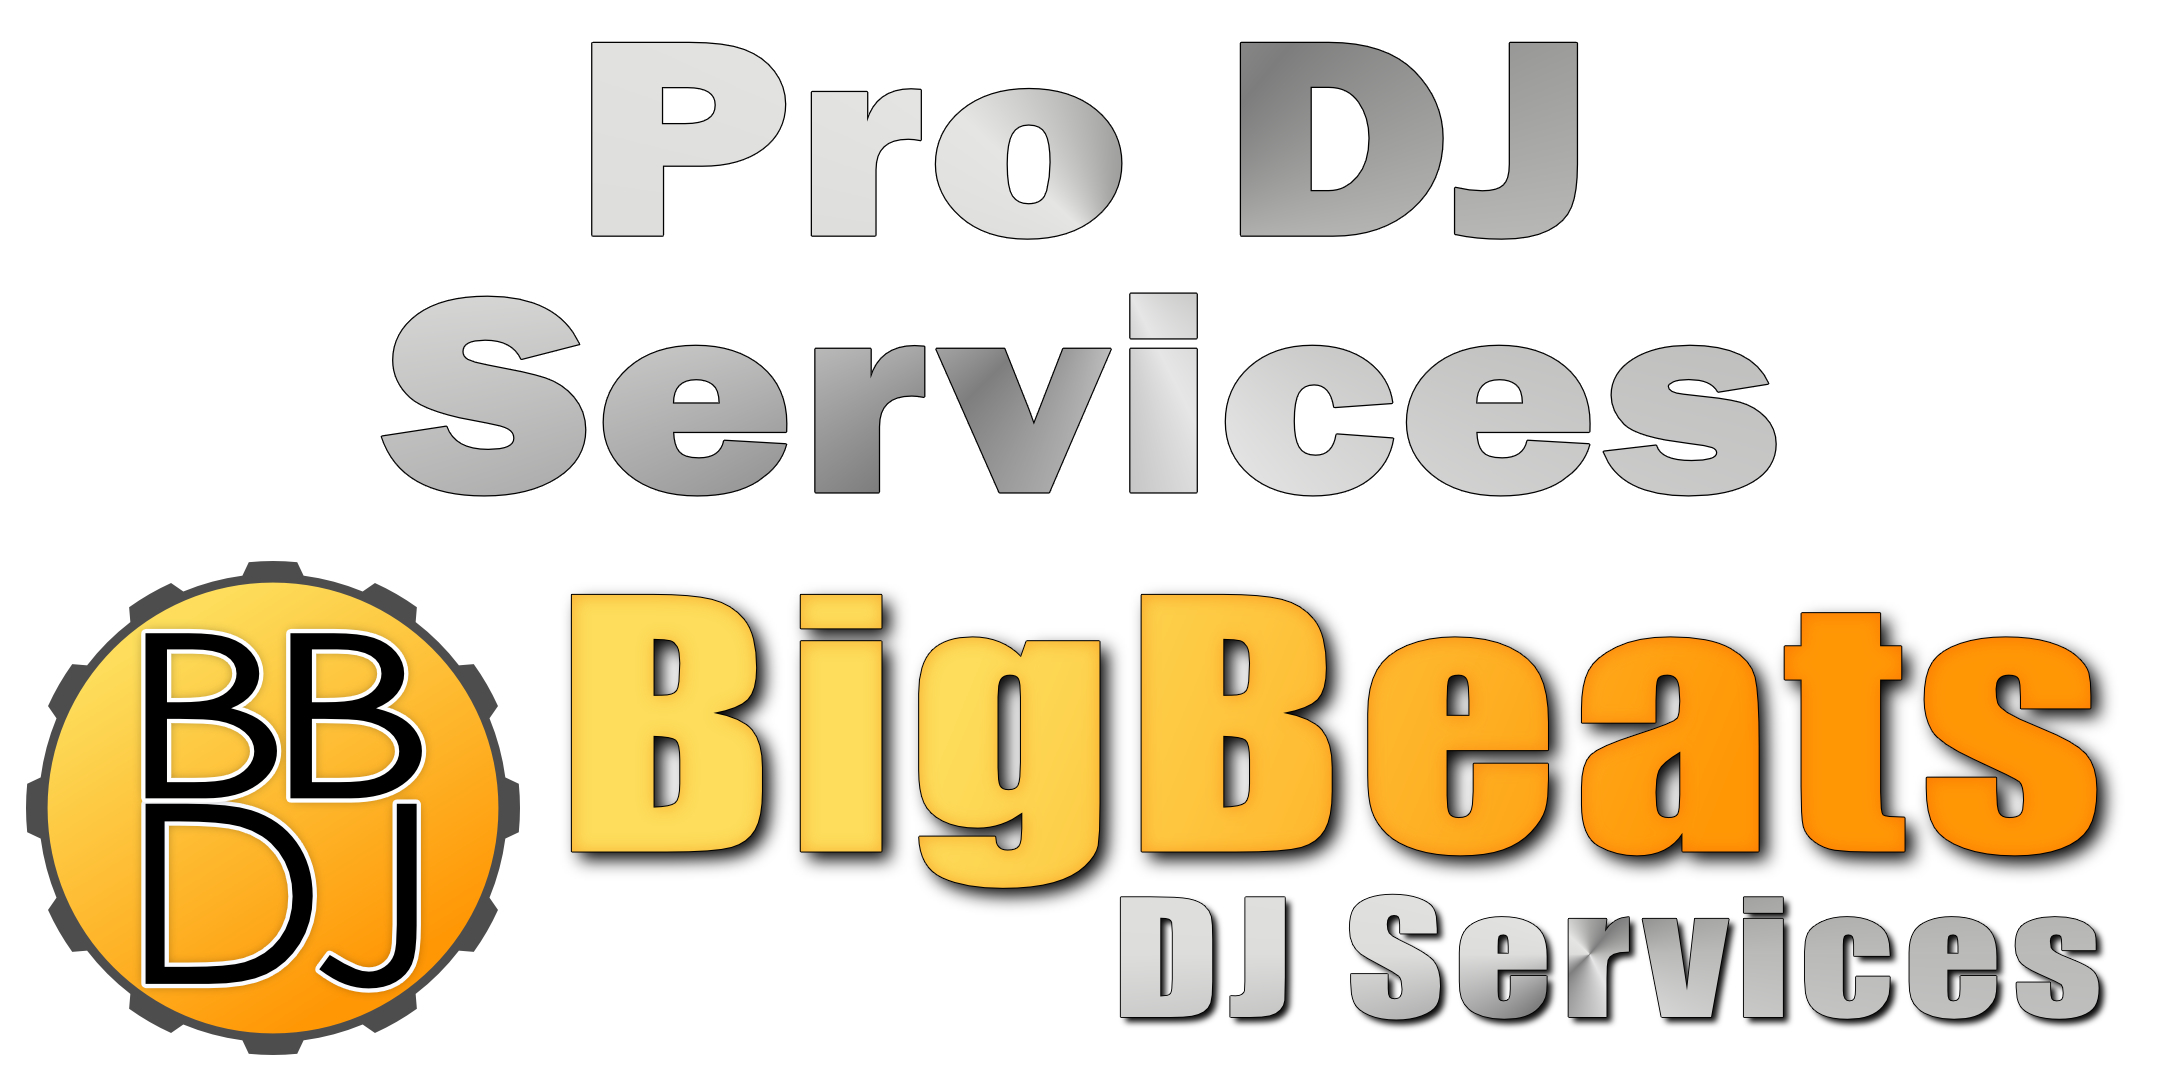 Signature DJ Services.jpg